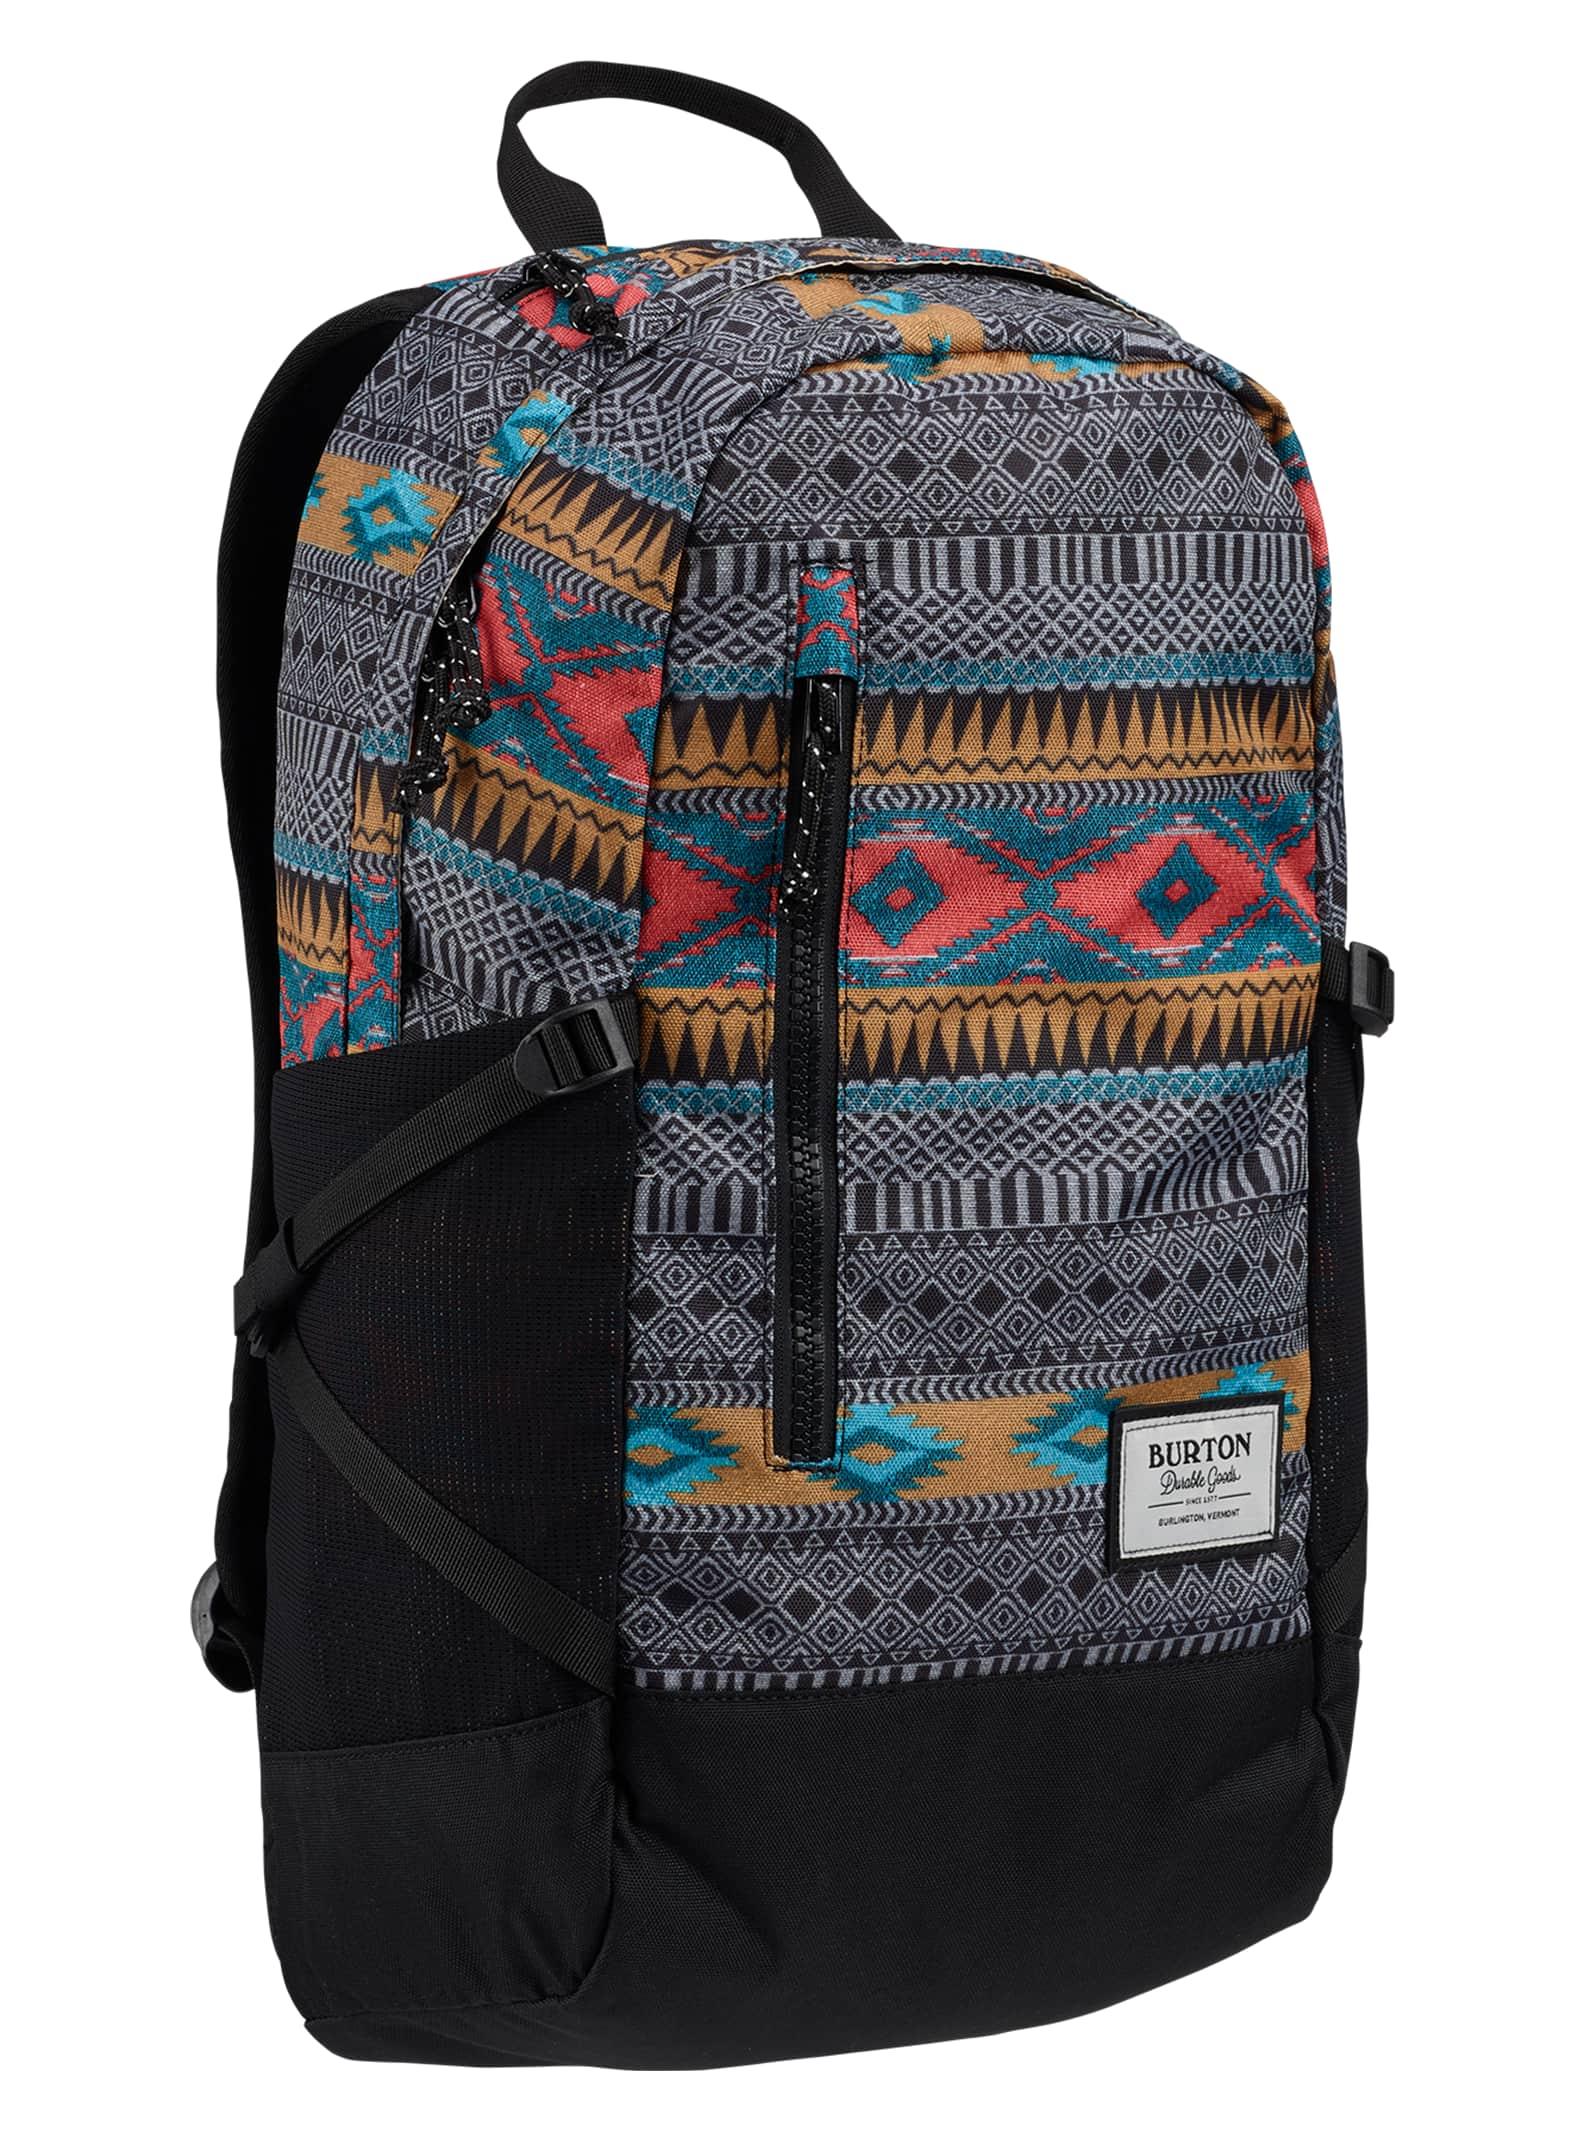 Backpacks   Burton Snowboards 79e2c16fcf